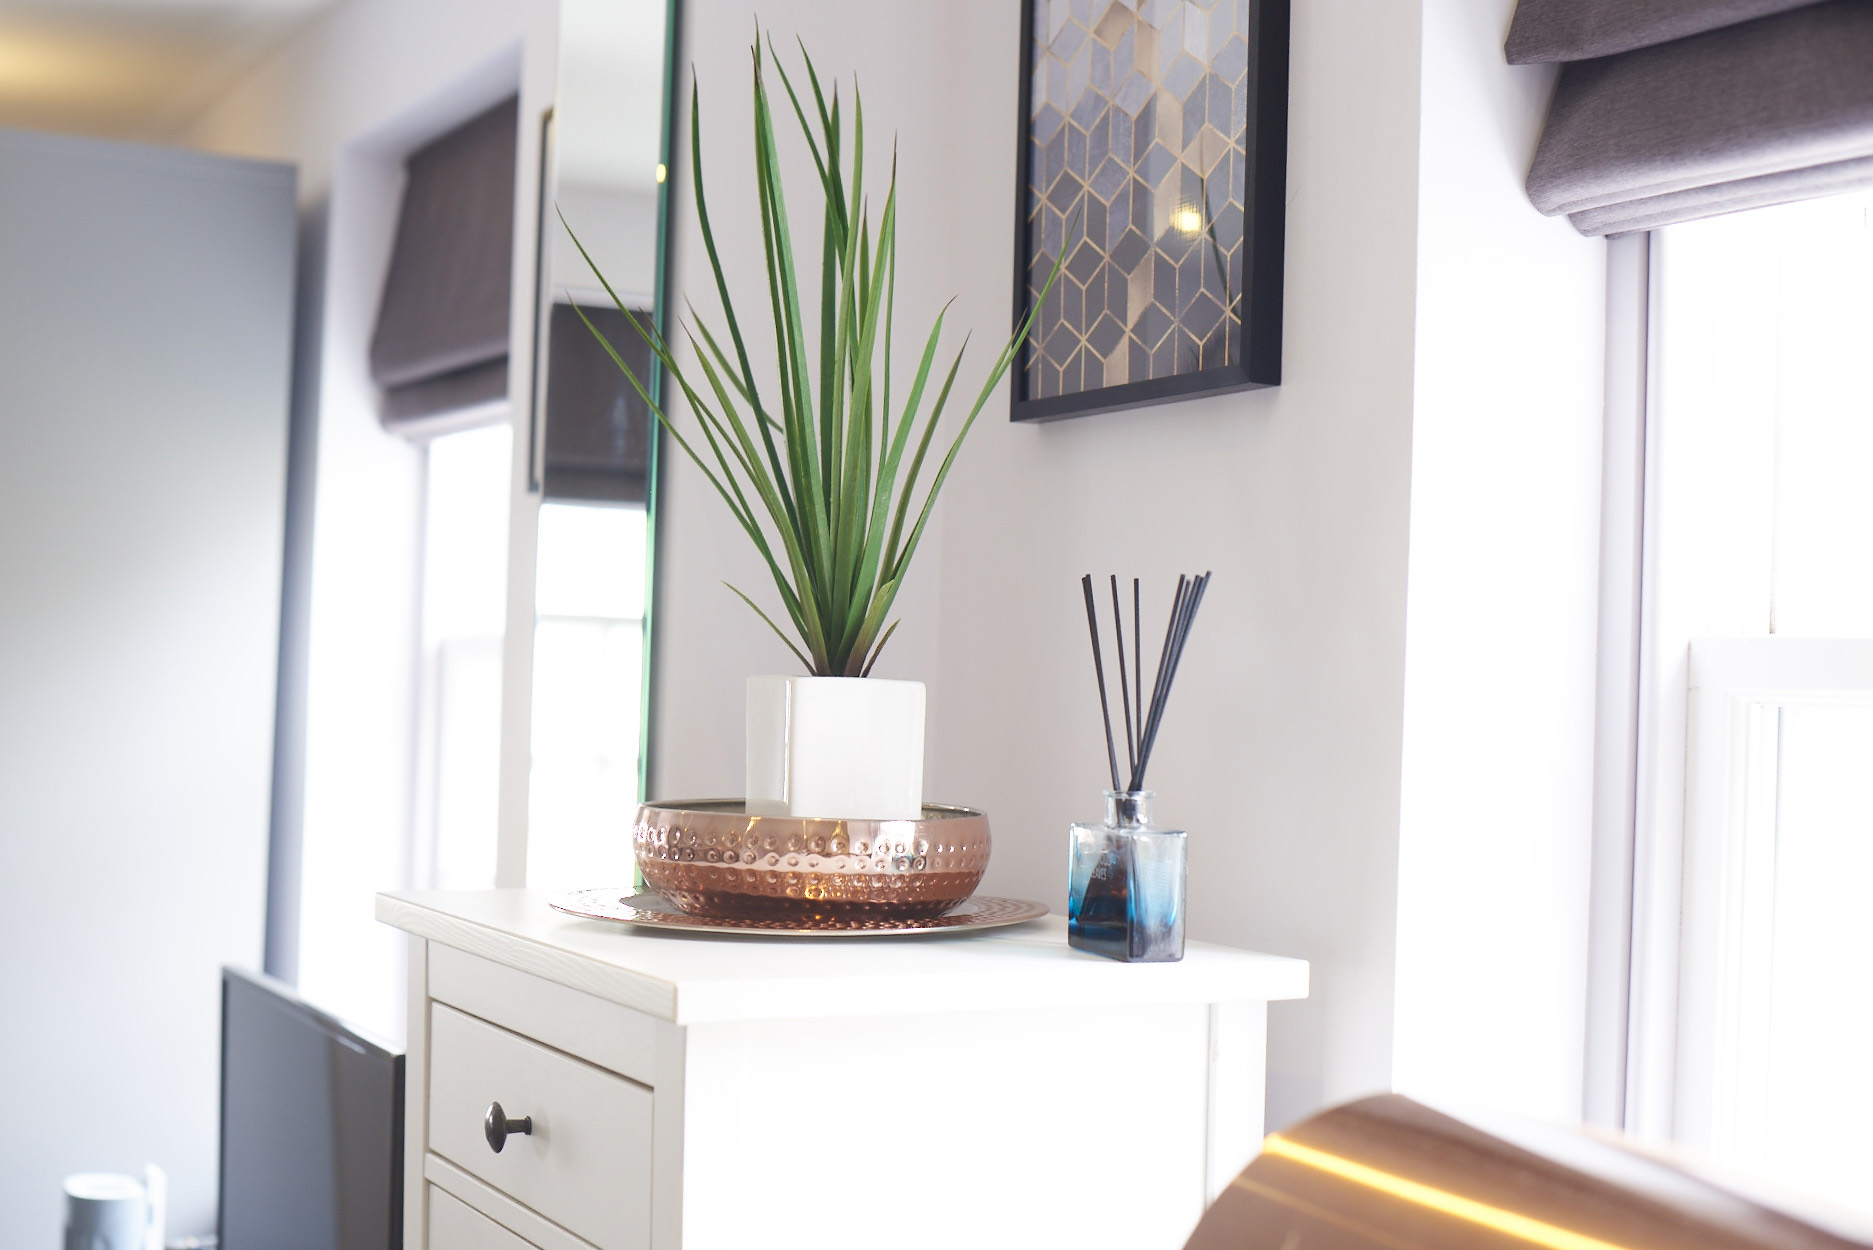 Plant on Tallboy